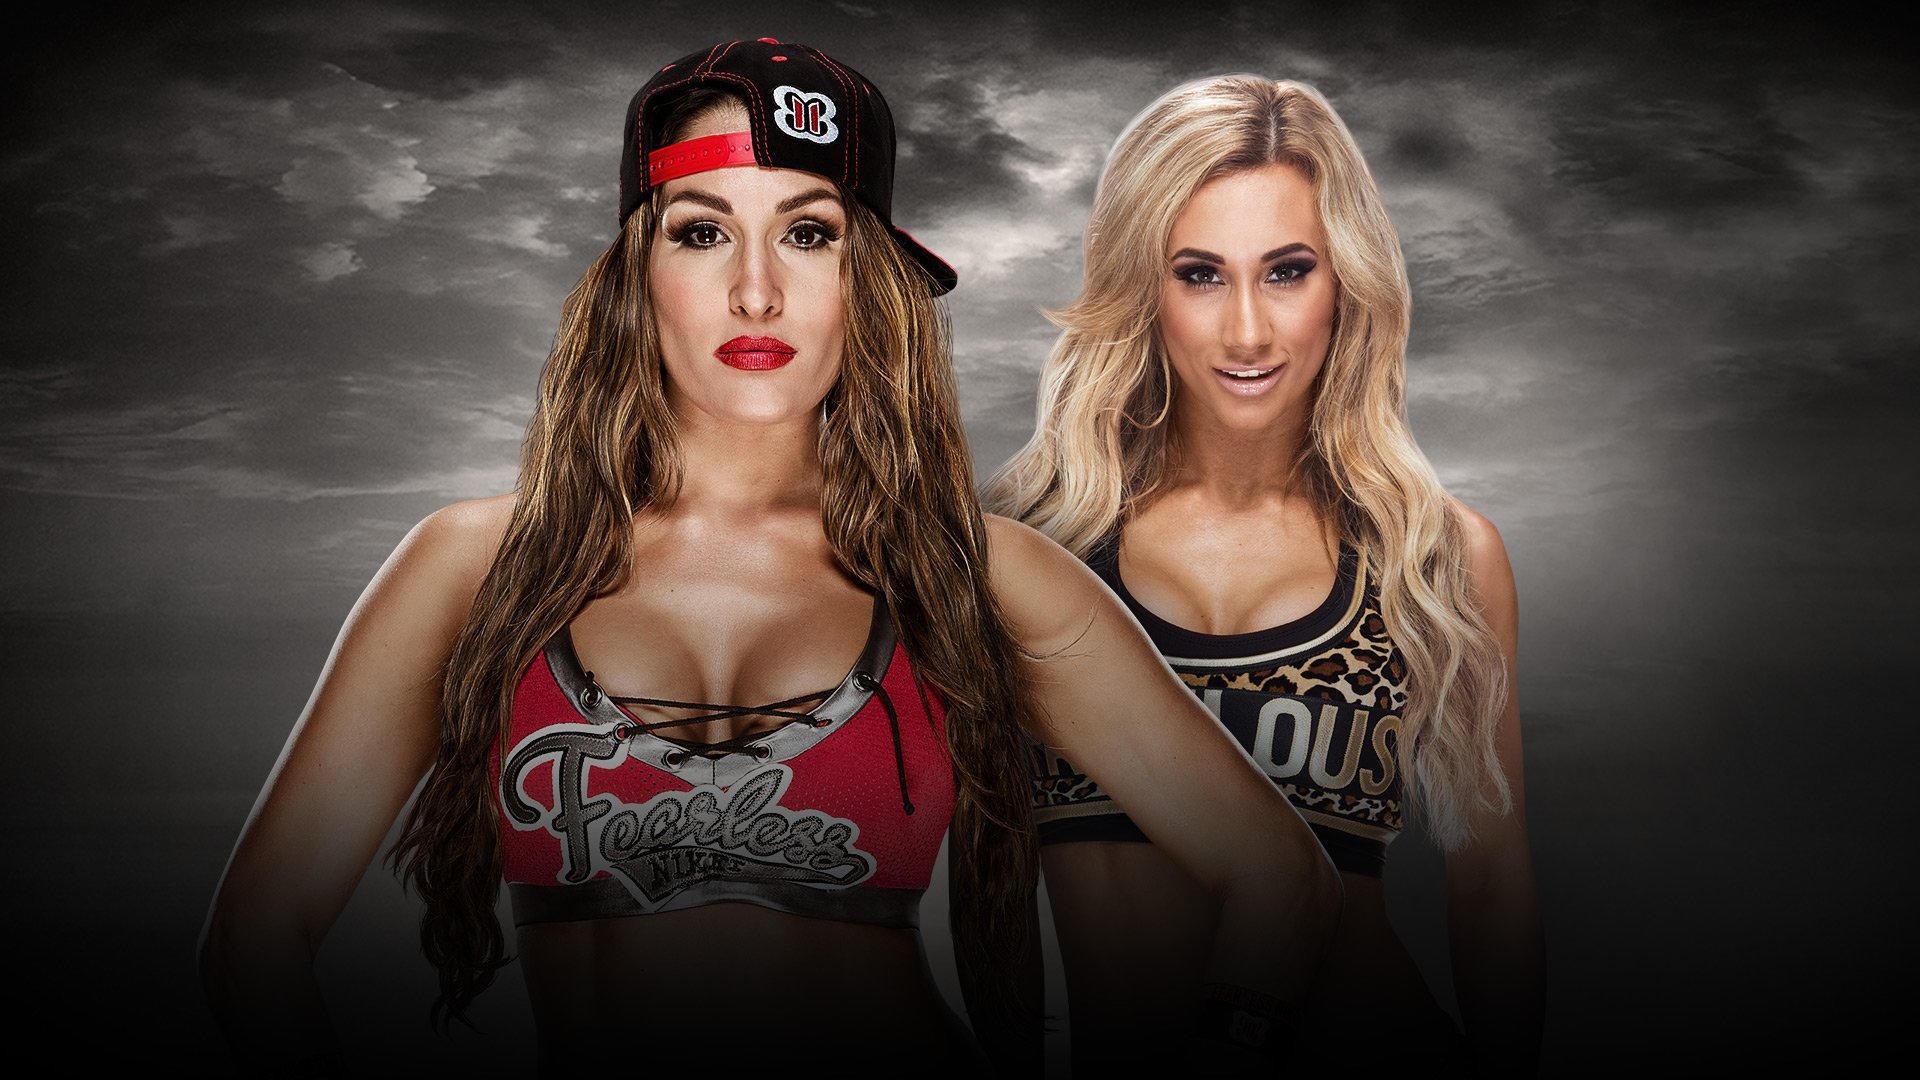 WWE NO MERCY - OCTOBER 9 - SACRAMENTO, CALIFORNIA 20160927_Nomercy_BrieCarmella--a57bca04a8aa419165b776e0fb93667f